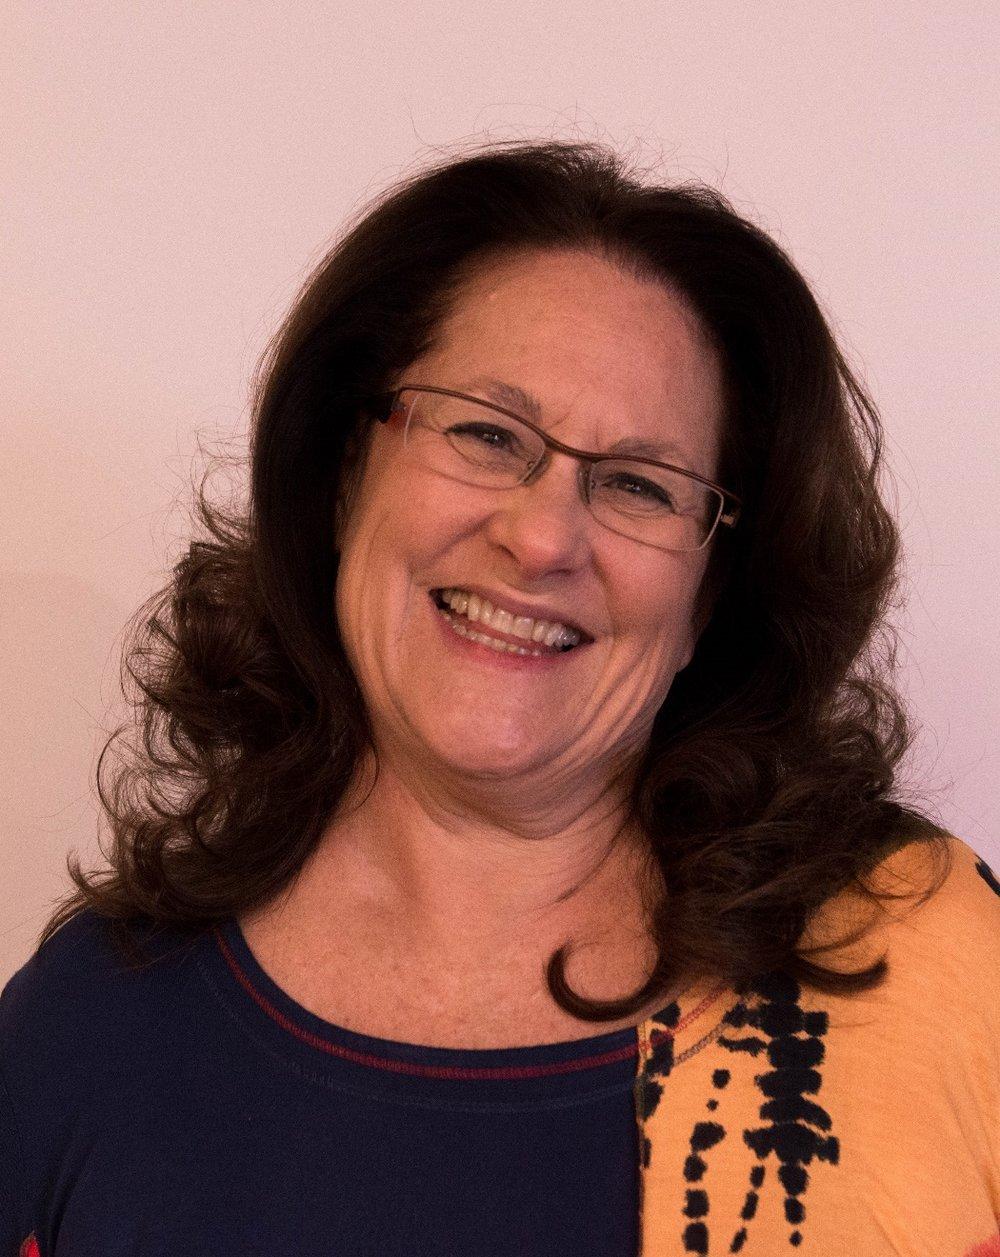 Adele Sullivan